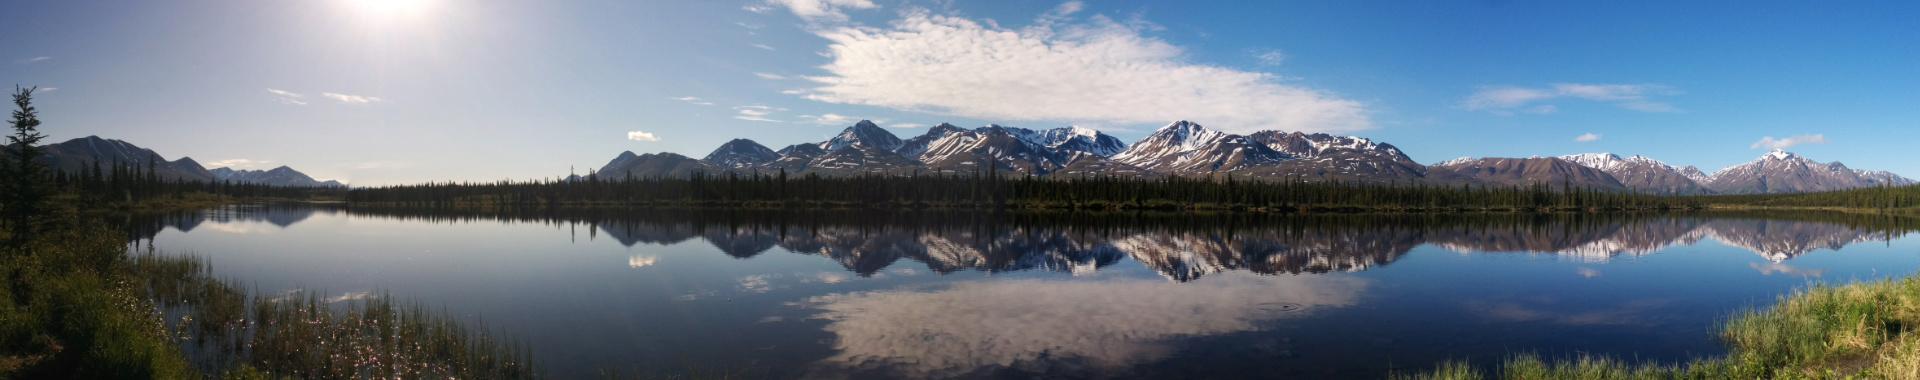 Alaska: An Arctic Adventure by Stephan Lorenz